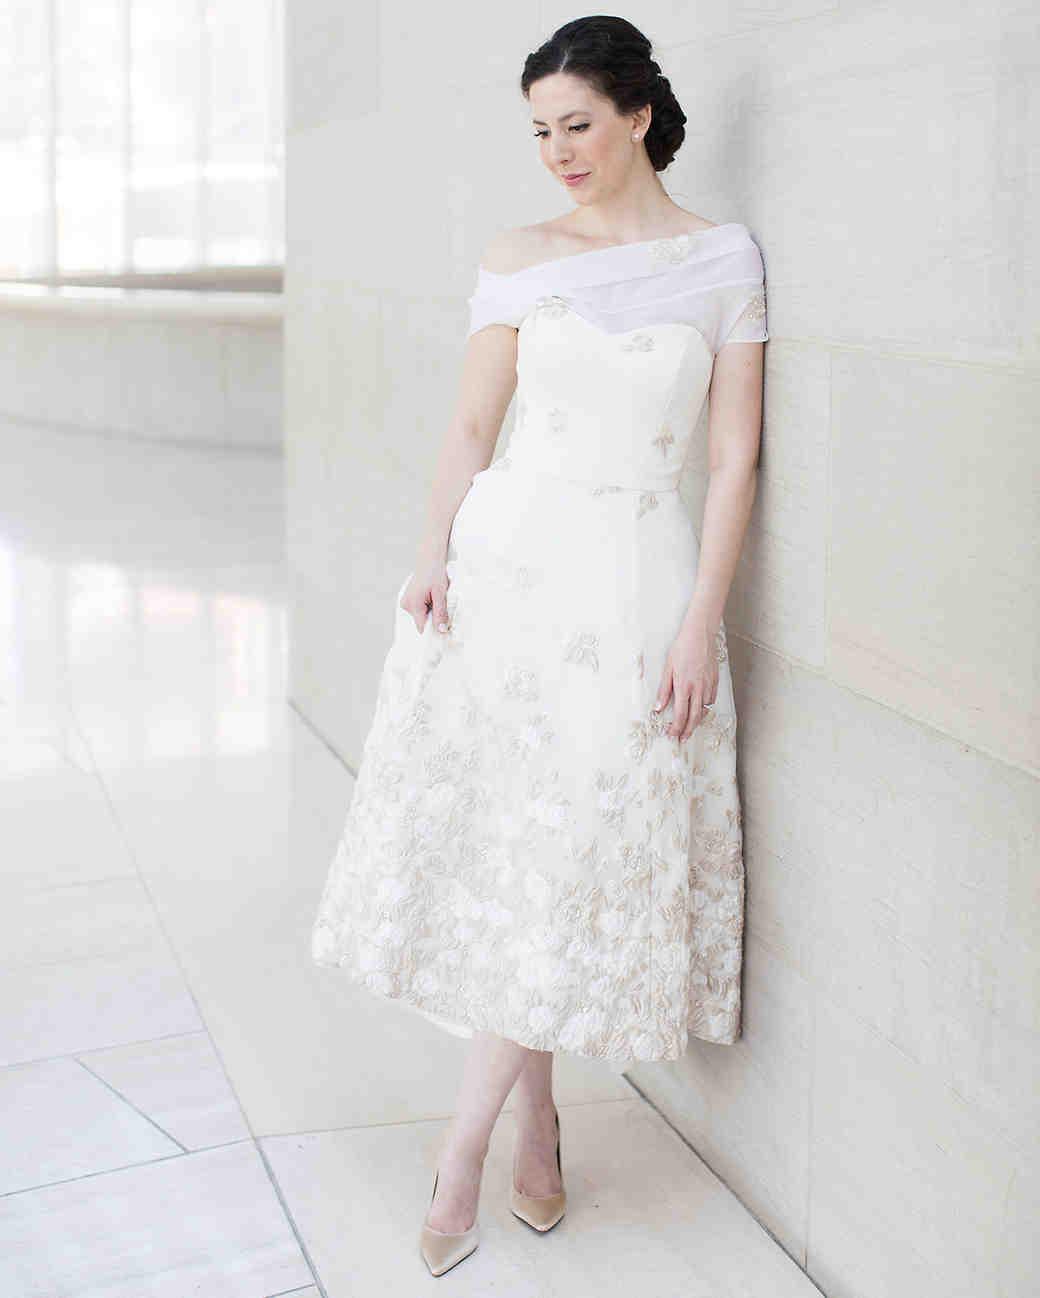 Wedding Reception Dresses Oneshoulder Tea Length Gown: Chagne Sequined Wedding Dress At Reisefeber.org